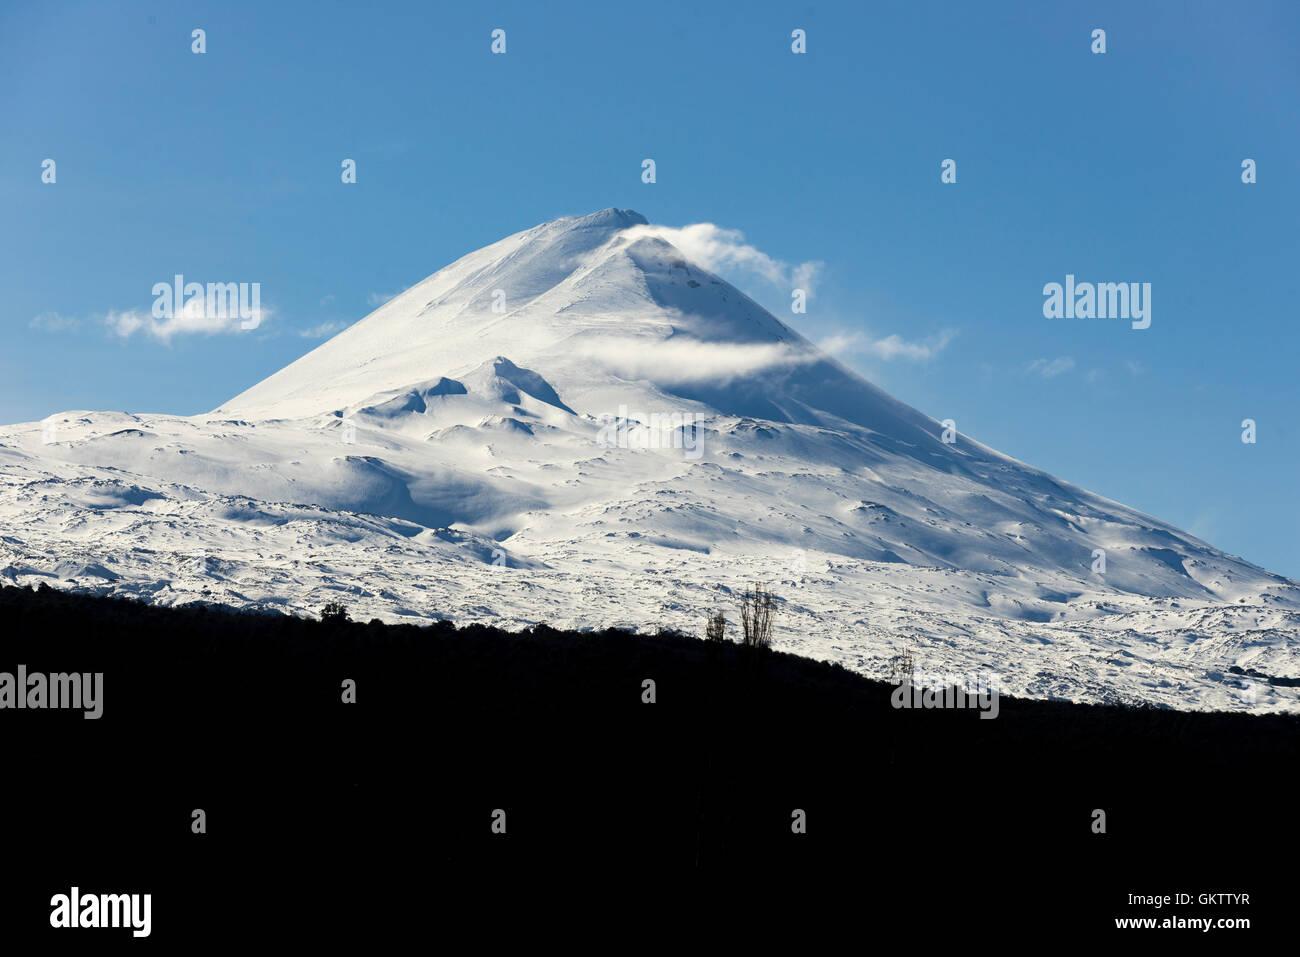 Volcan LLaima, region de la Araucania. LLaima Volcano, Araucania region. Patagonia, Chile. - Stock Image